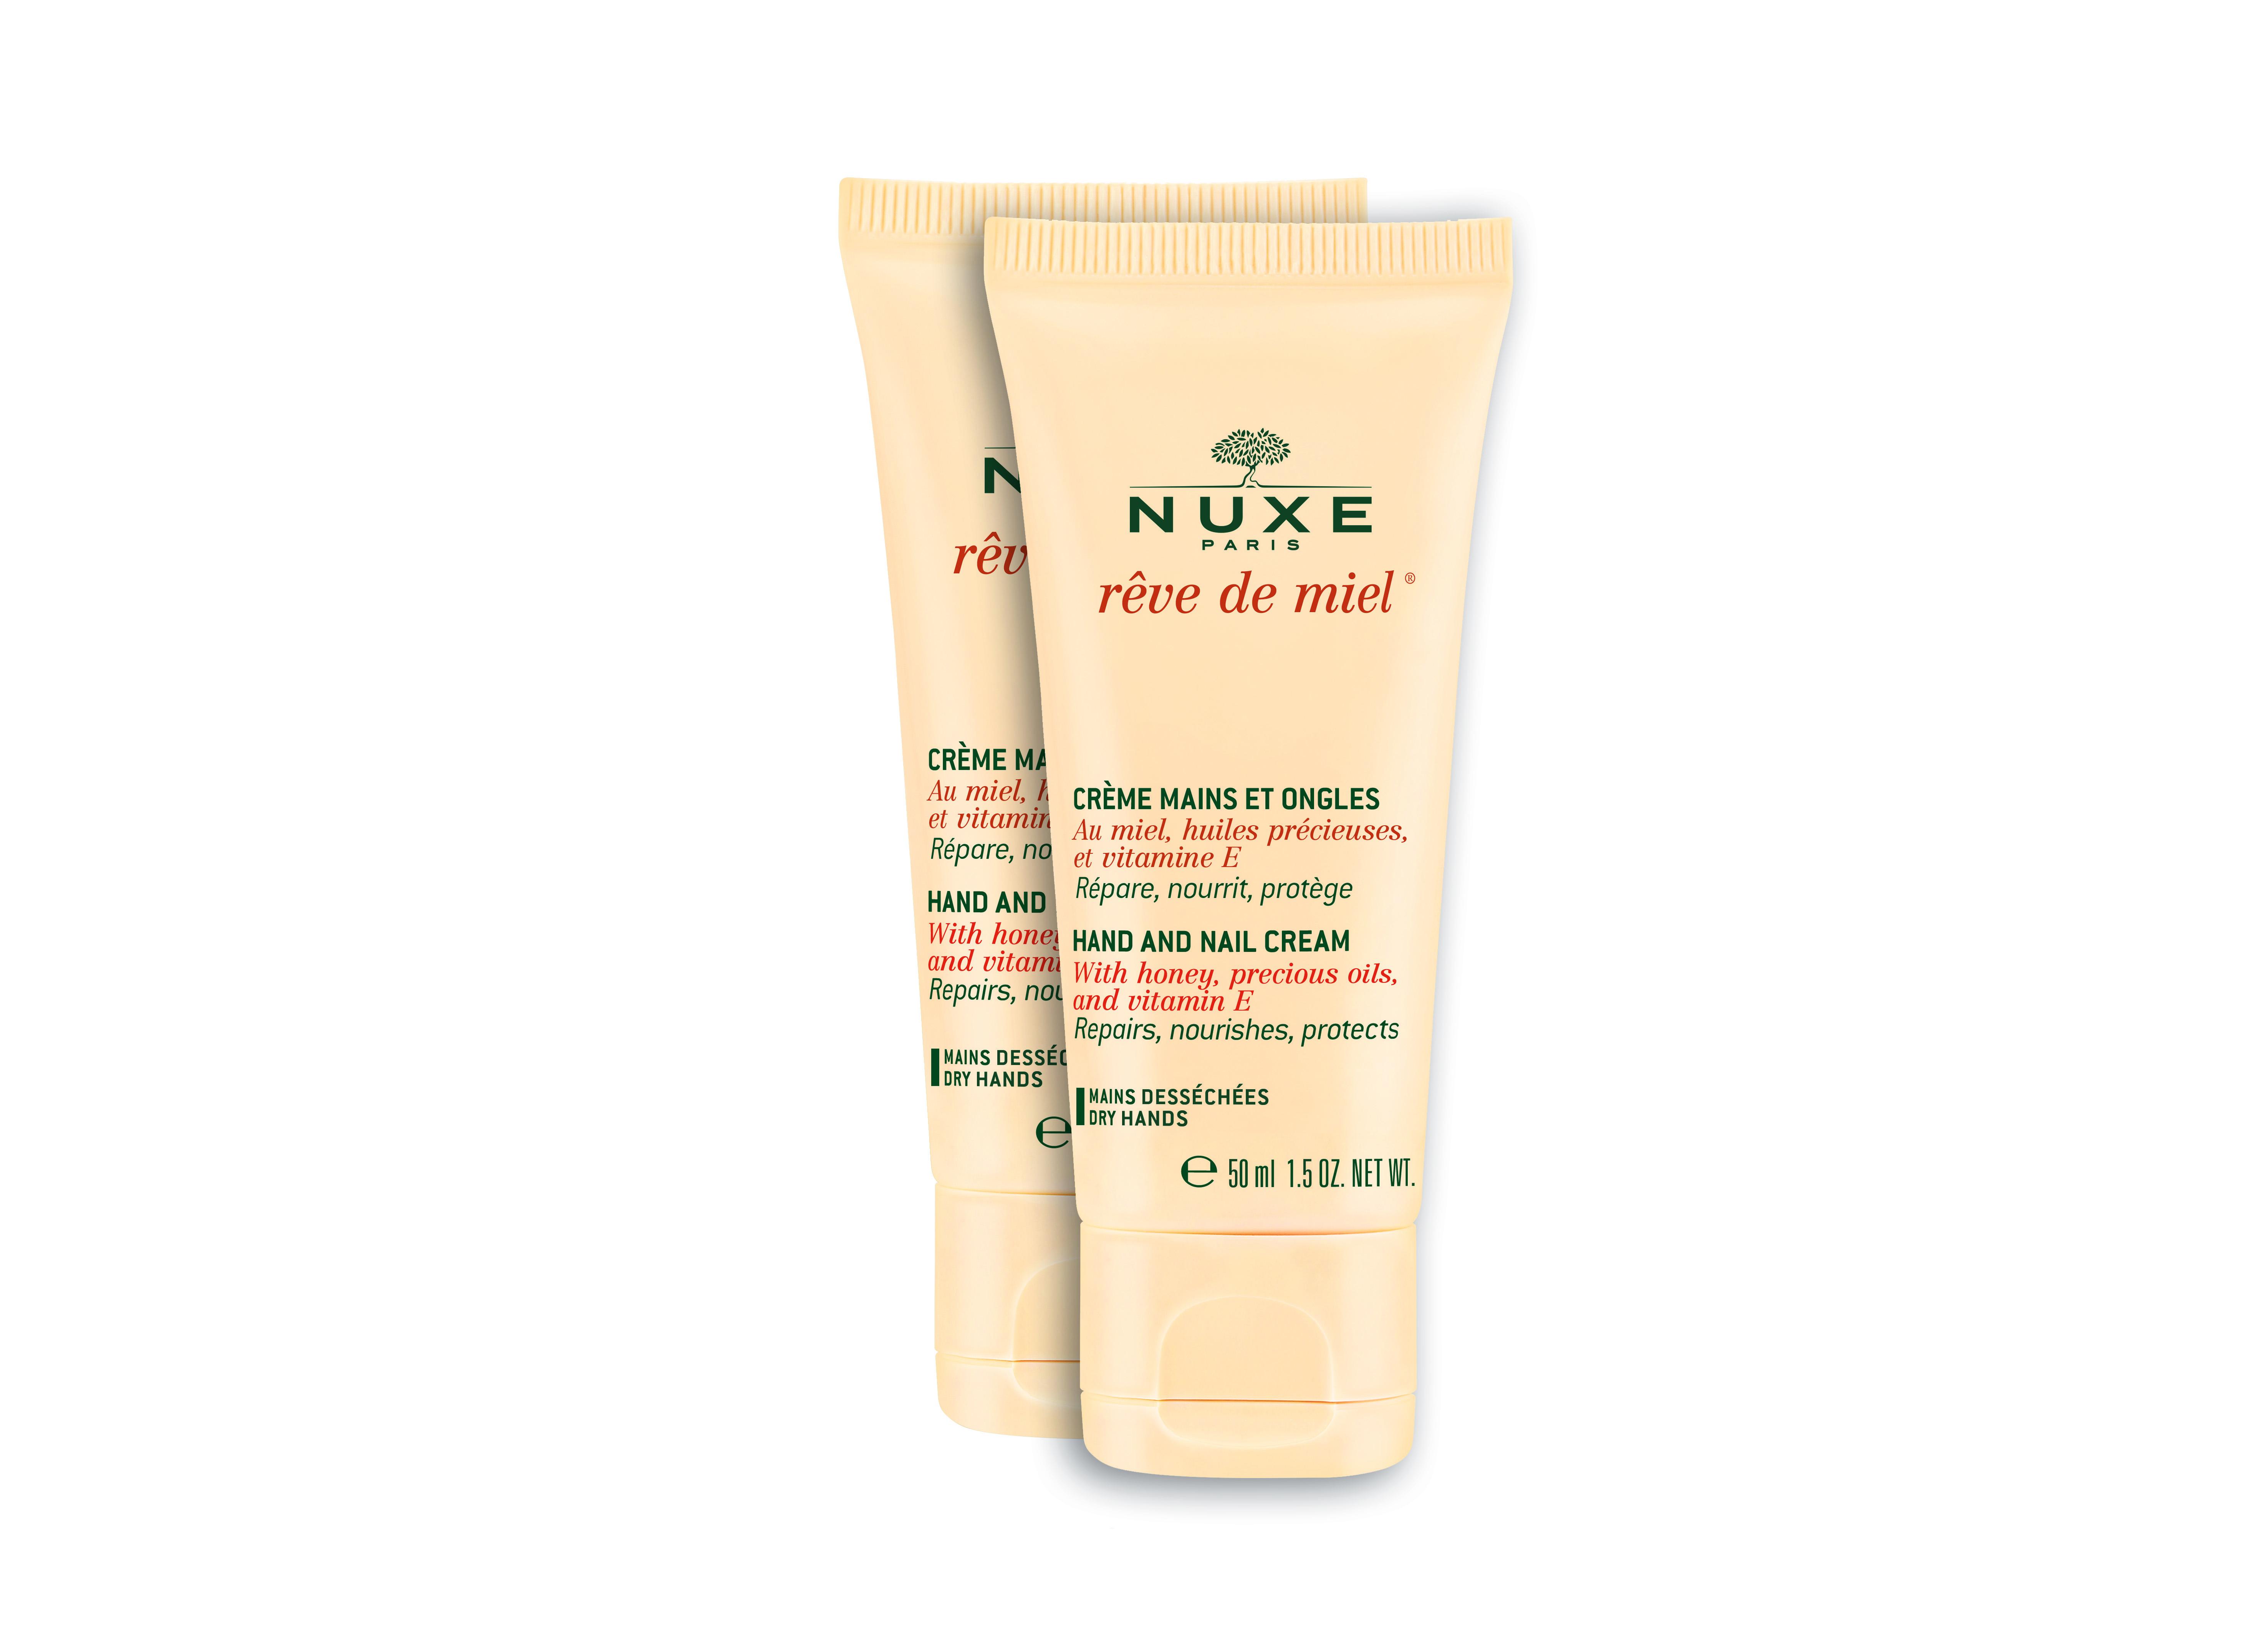 Nuxe - Rêve de Miel Hand and Nail Cream 2x50 ml - Gift Set